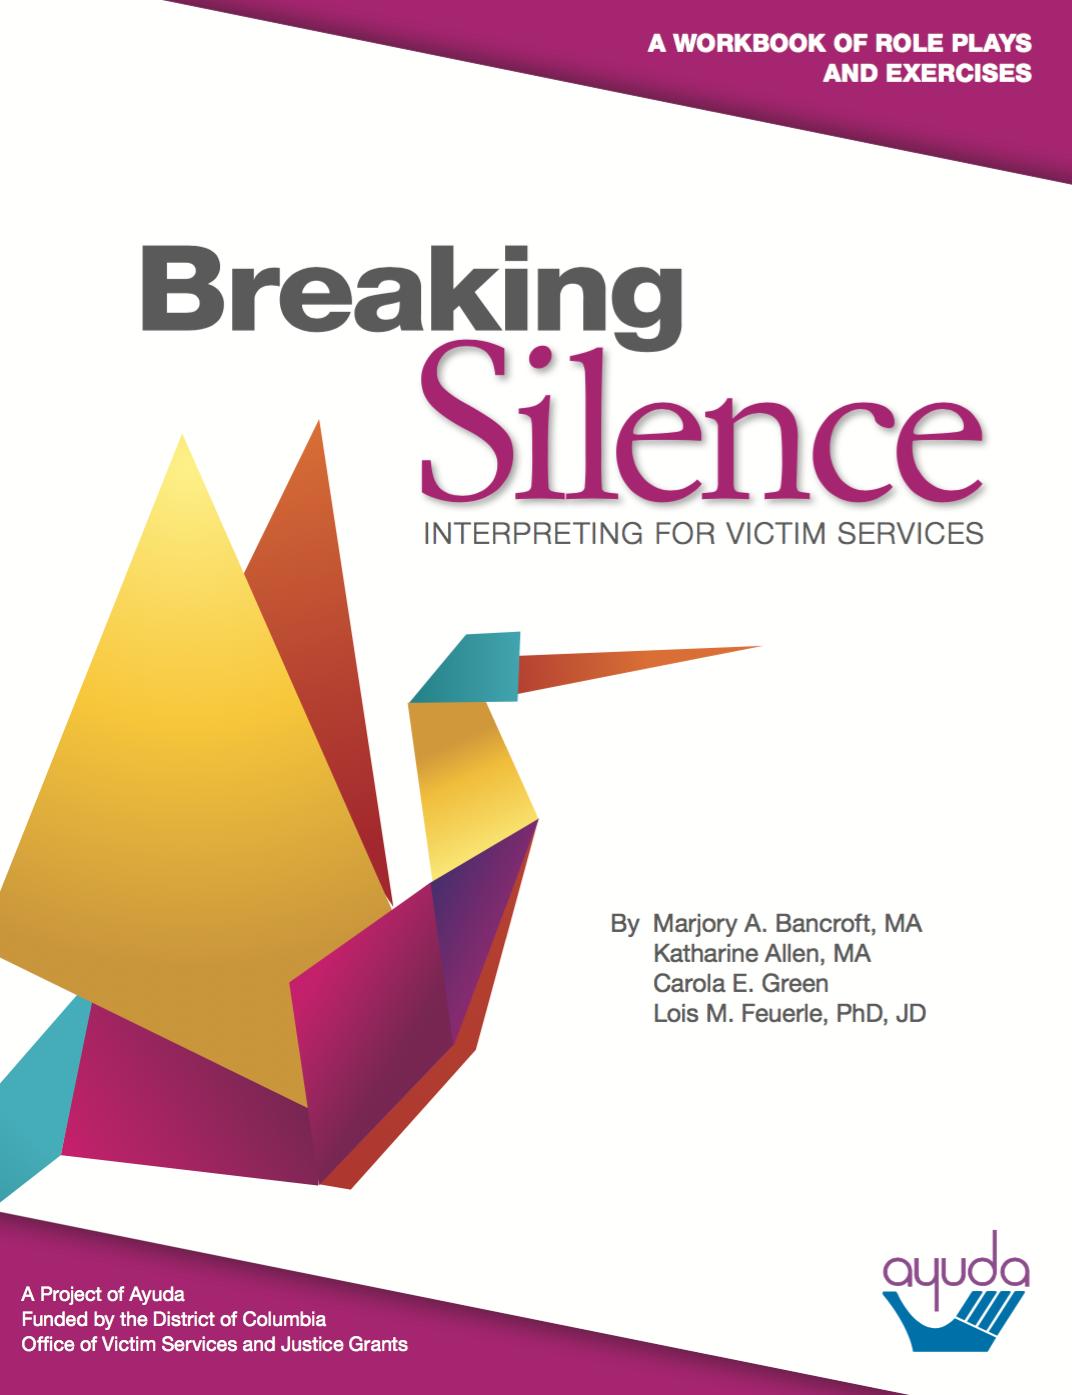 Breaking Silence Workbook thumbnail.png